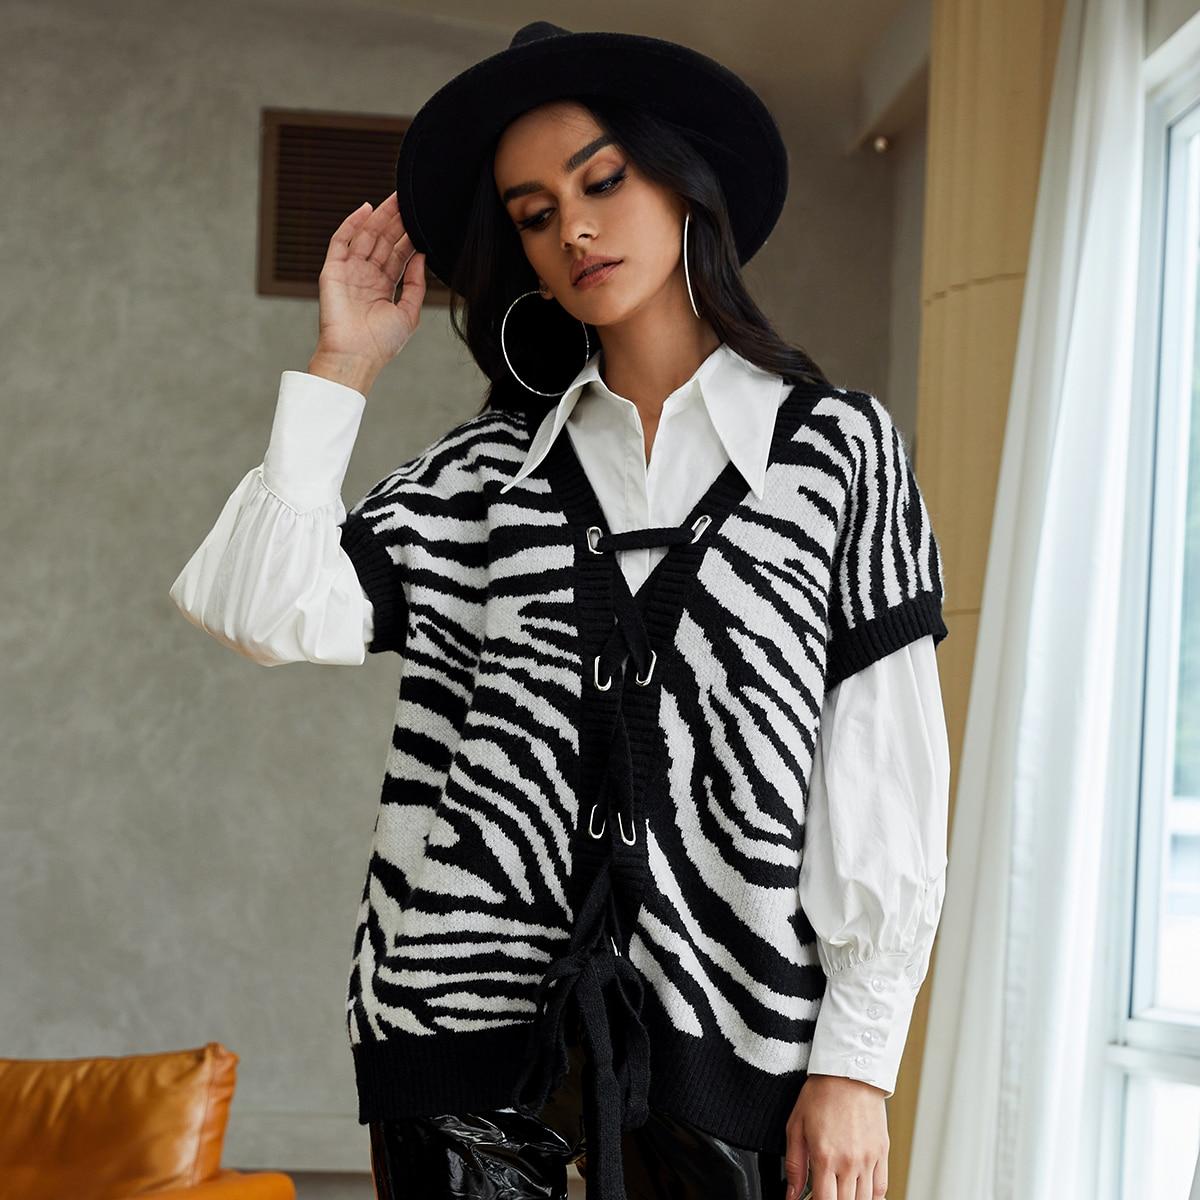 Zebra Stripe Lace Up Sweater Vest With Blouse